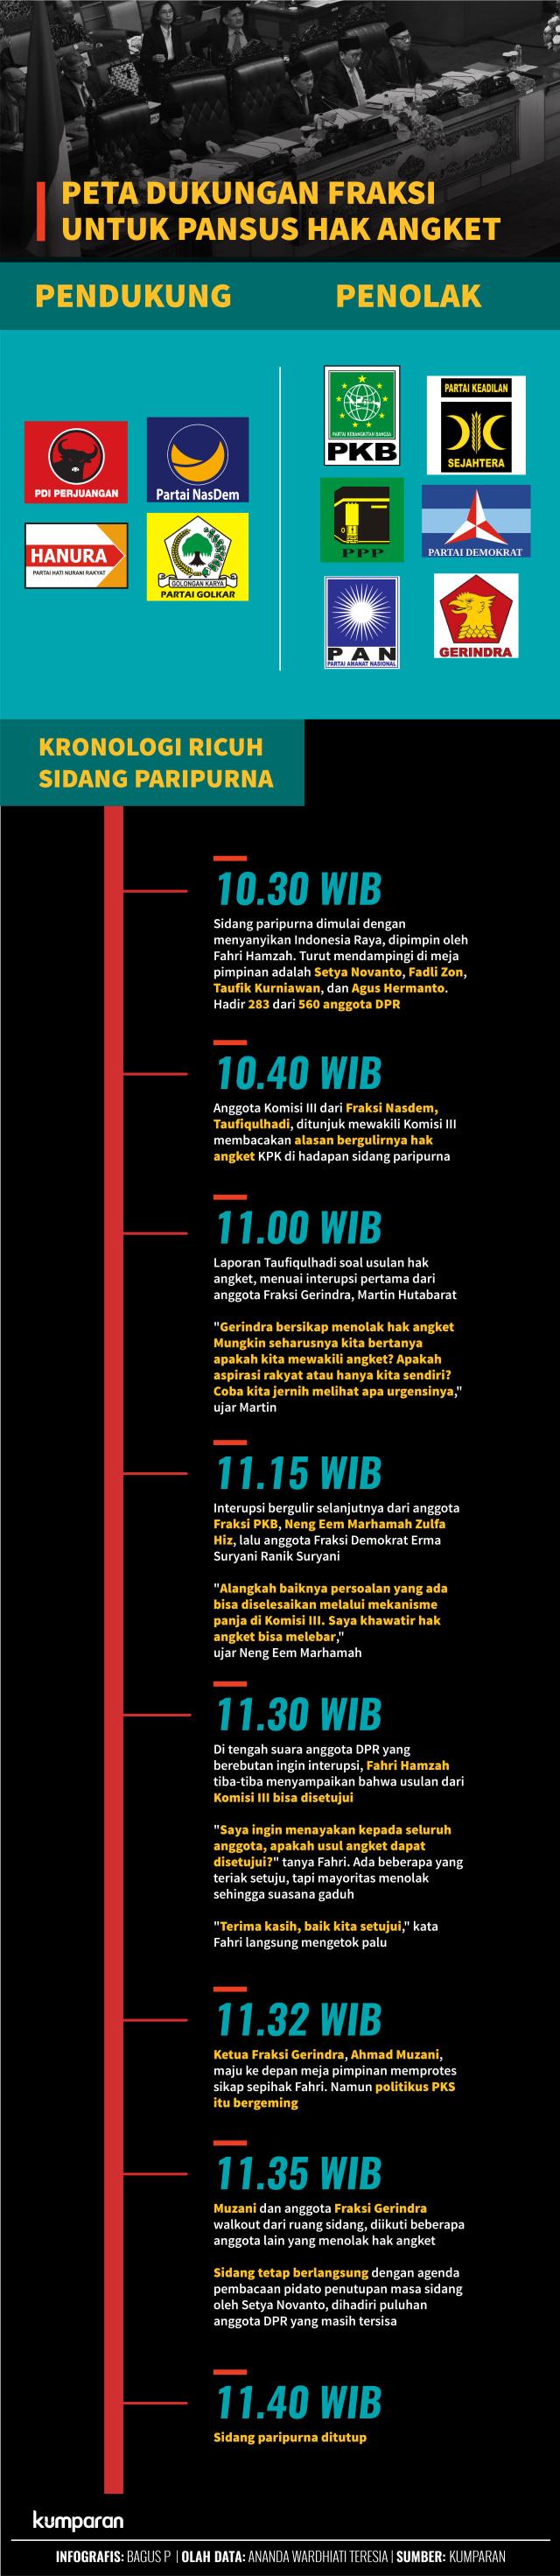 Infografis: Pendukung Jokowi yang Berjuang demi Hak Angket KPK (19135)